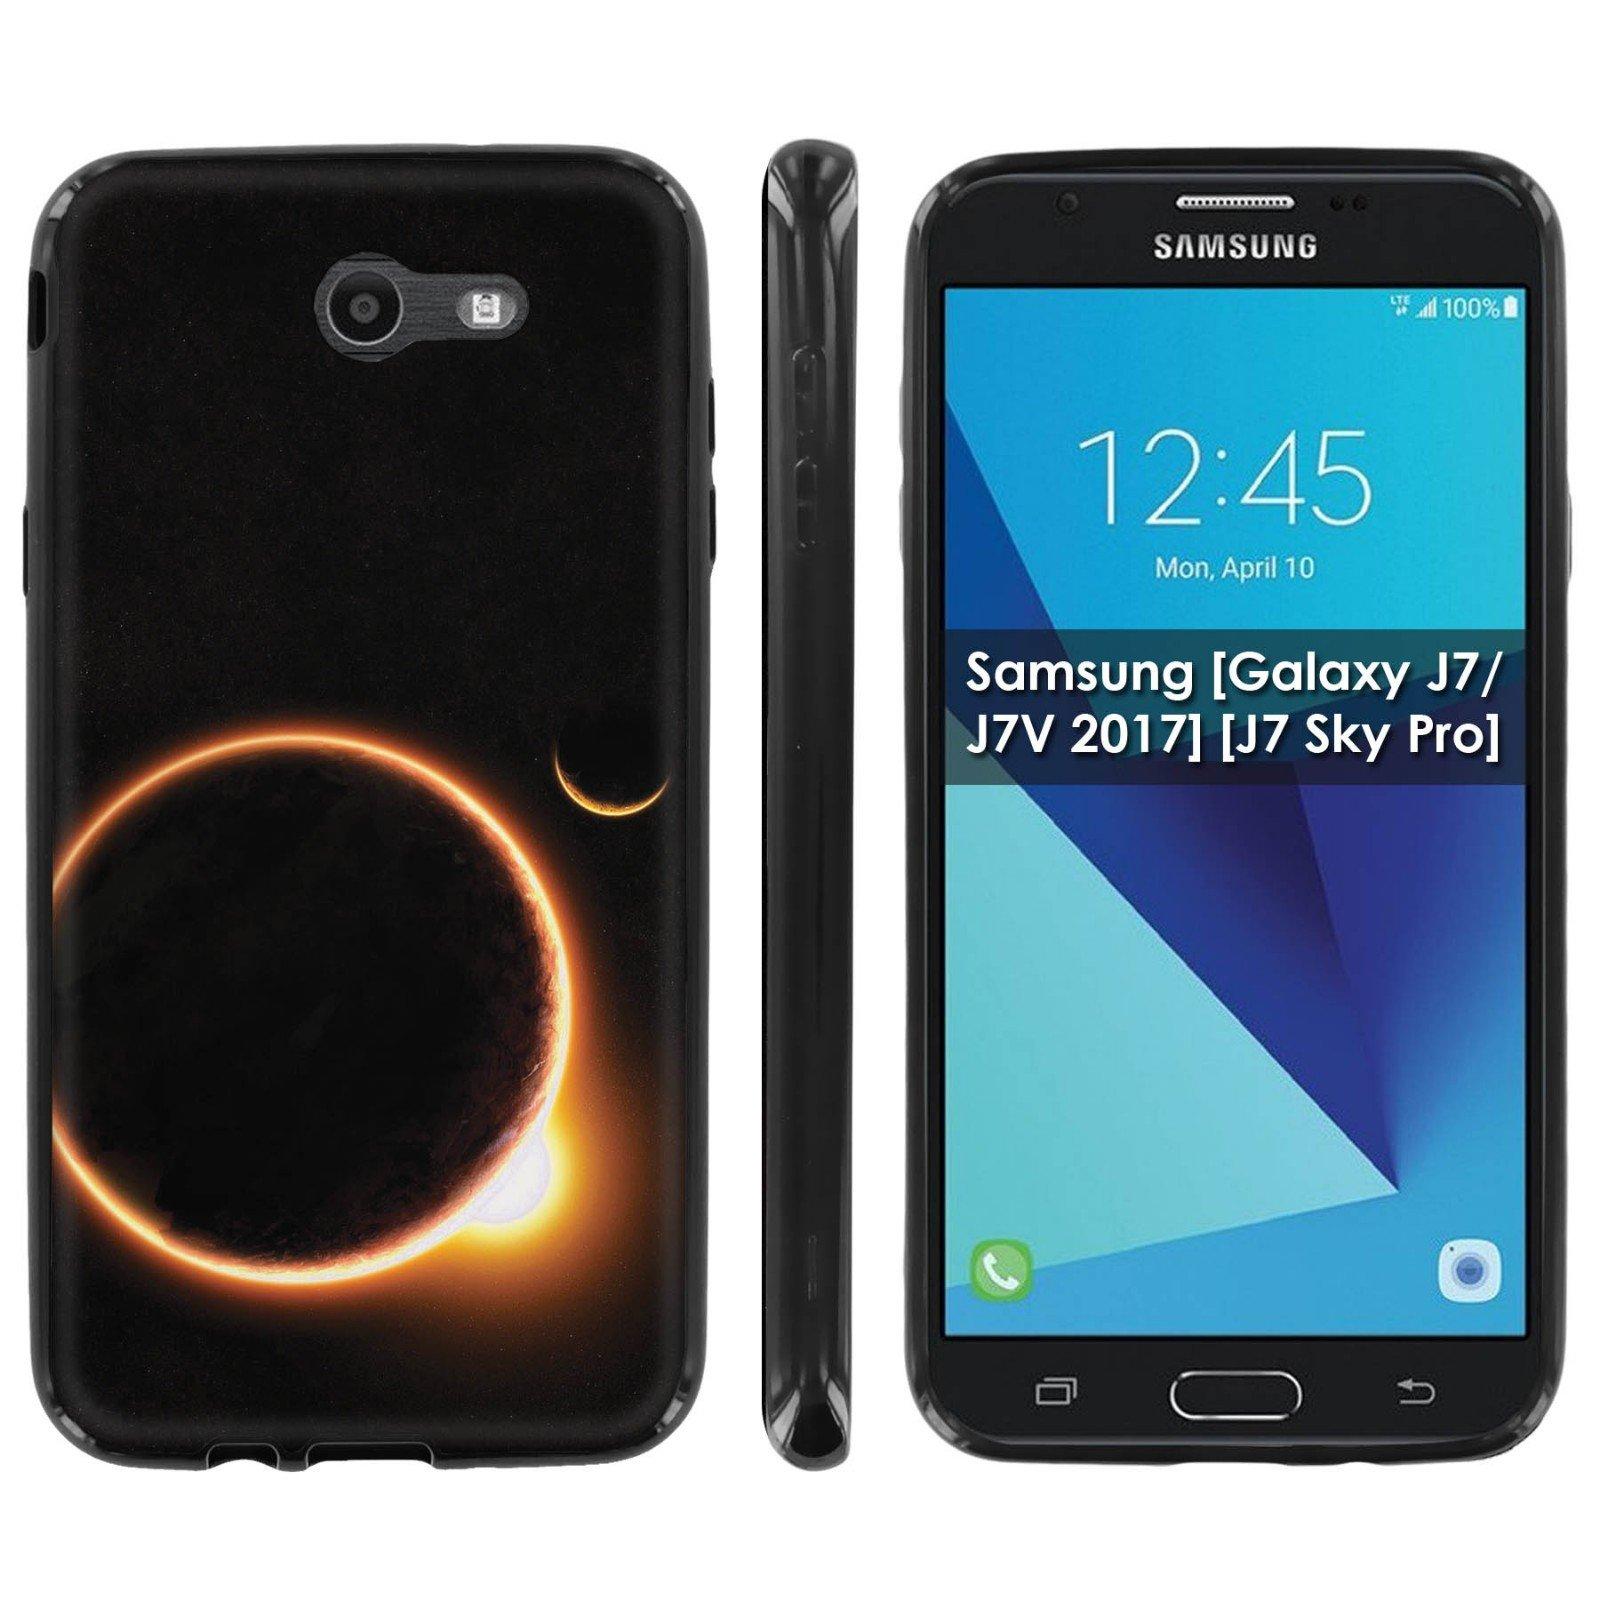 Samsung [Galaxy J7/J7V 2017] [J7 Sky Pro] Soft Mold [Mobiflare] [Black] Thin Gel Protect Cover - [Solar Eclipse] for Galaxy J7 [2017] [5.5'' Screen]